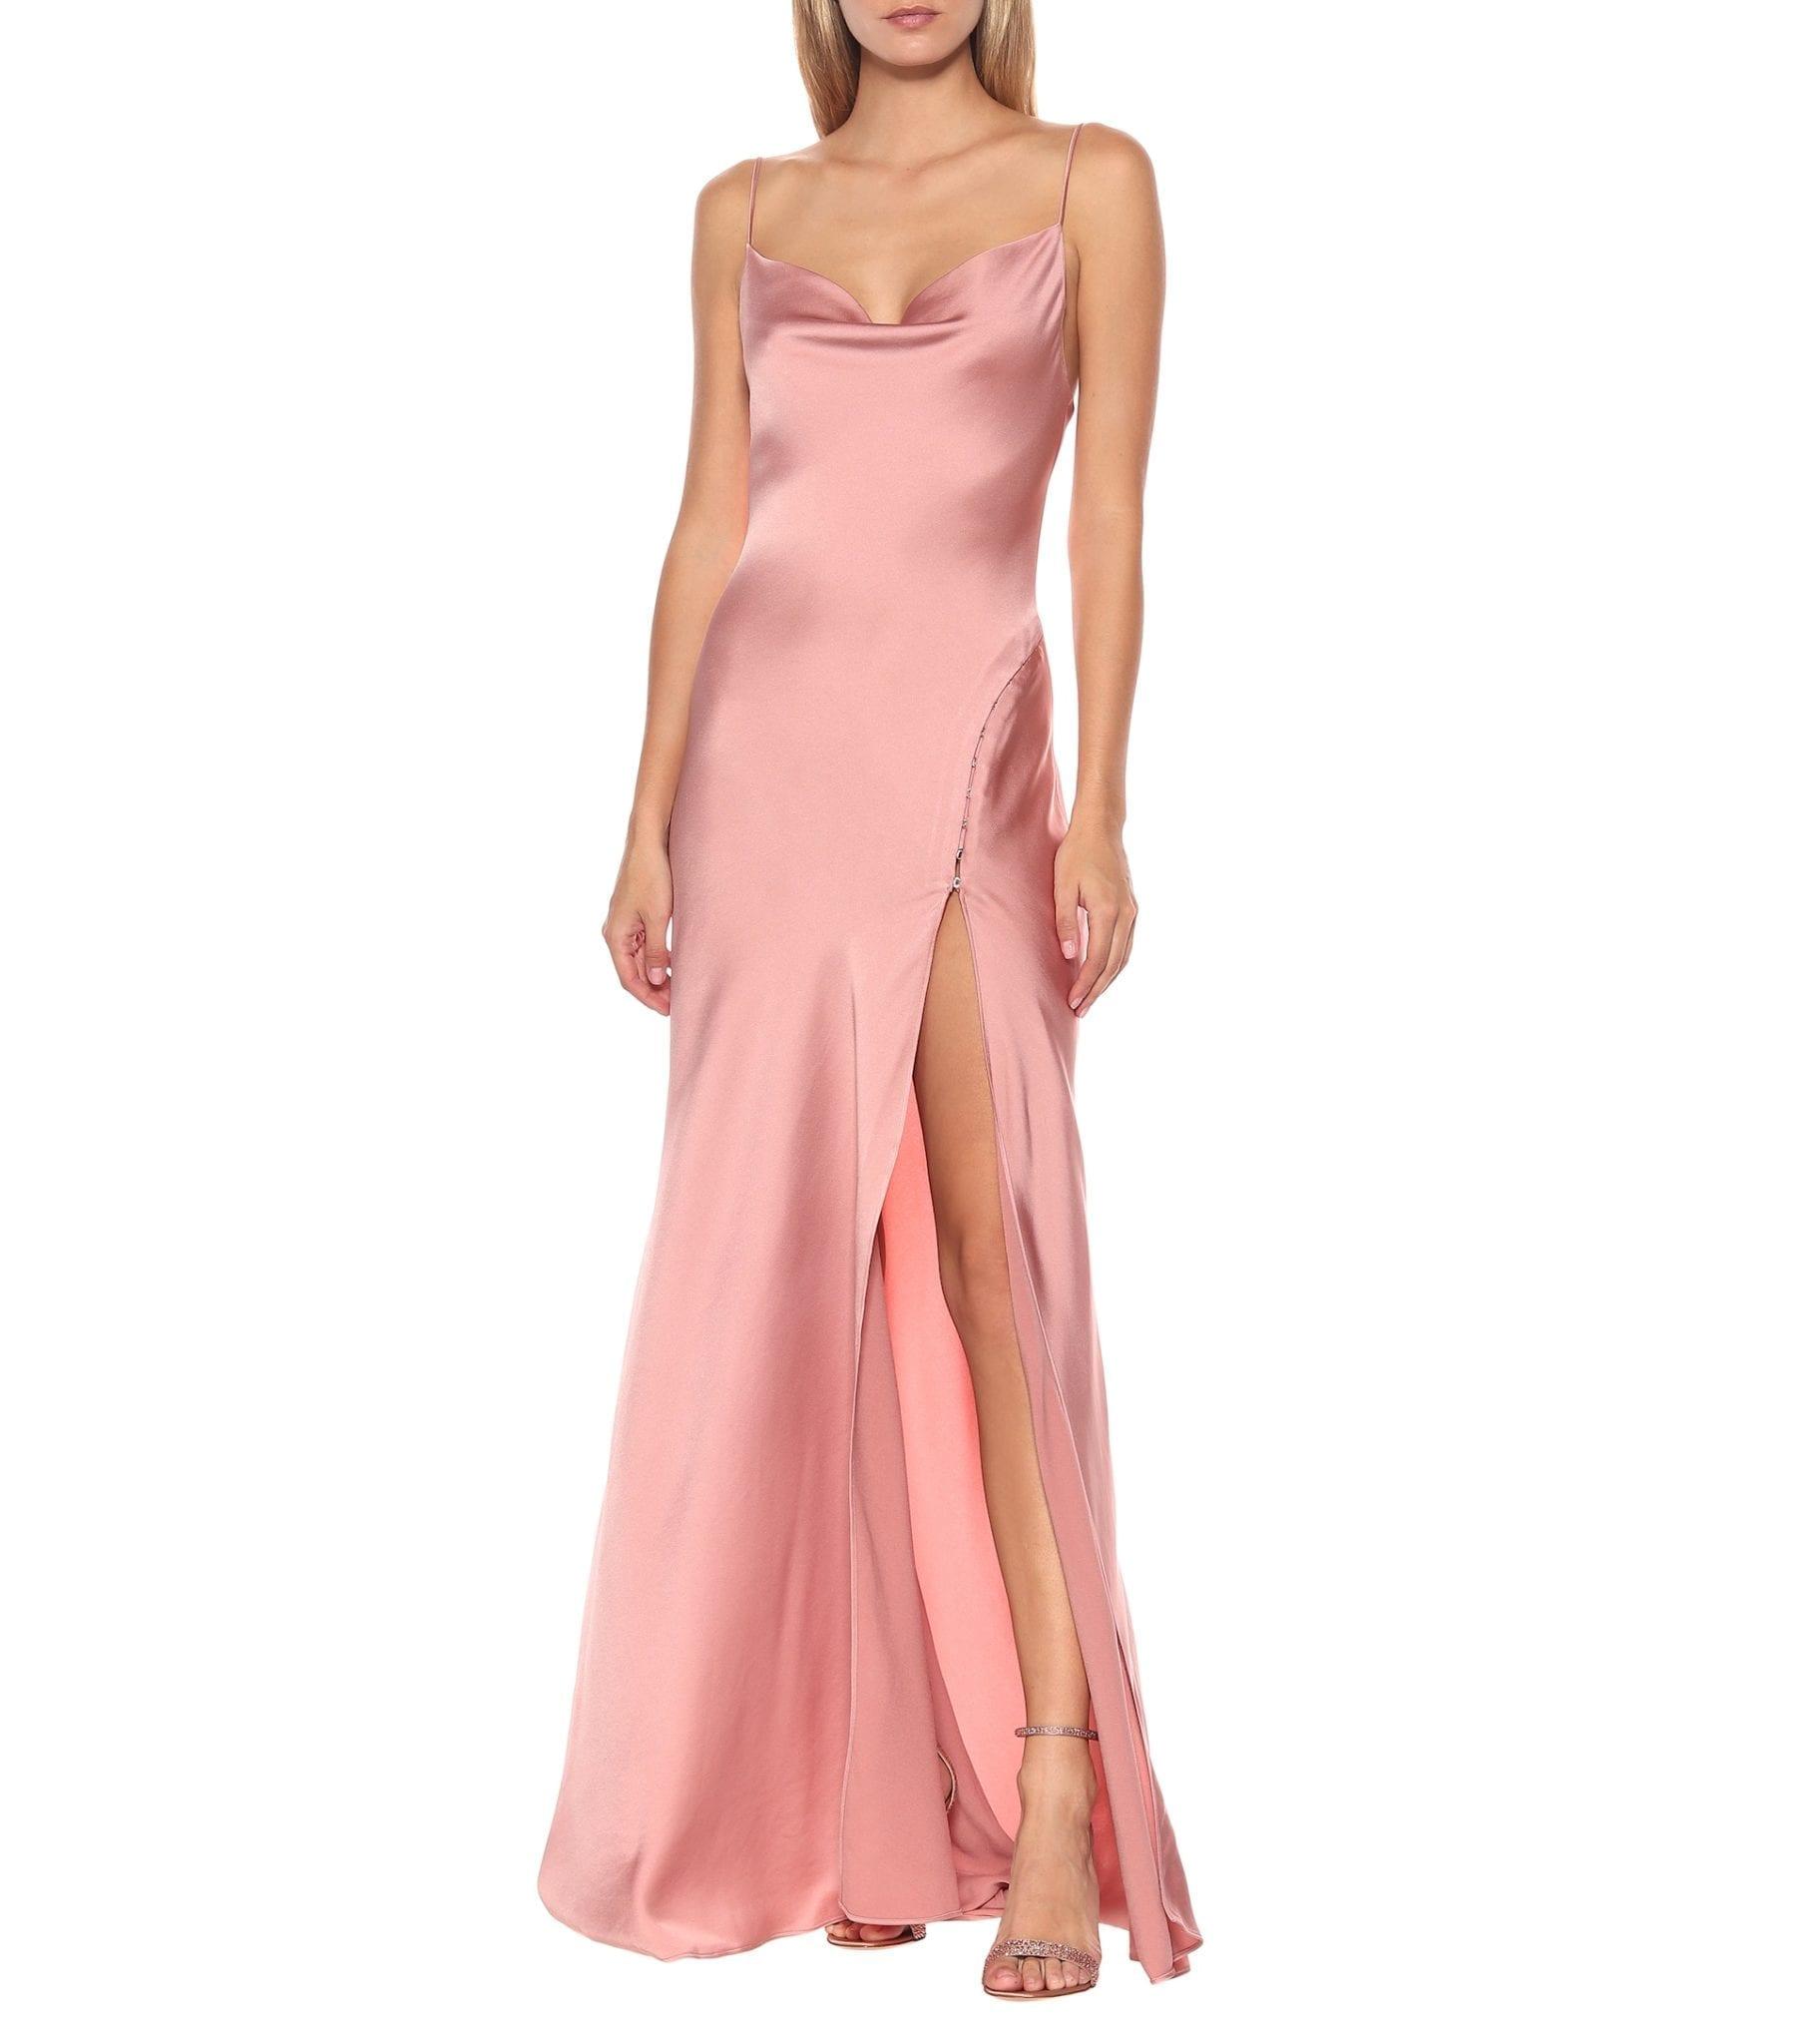 JONATHAN SIMKHAI Satin Maxi Slip Dress